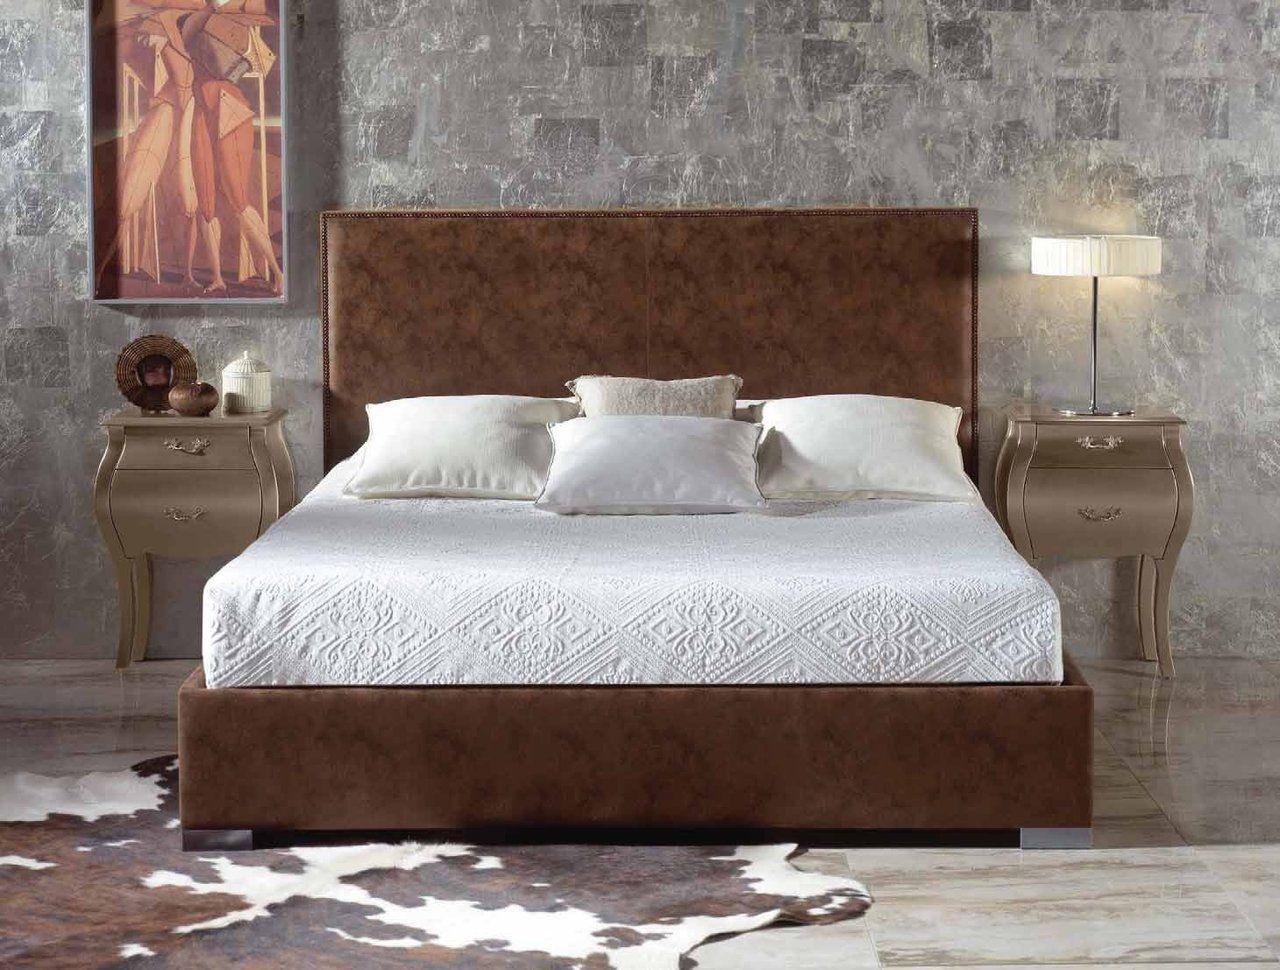 Cabeceros de cama tapizados lamparas sevilla - Cabeceros de cama antiguos ...